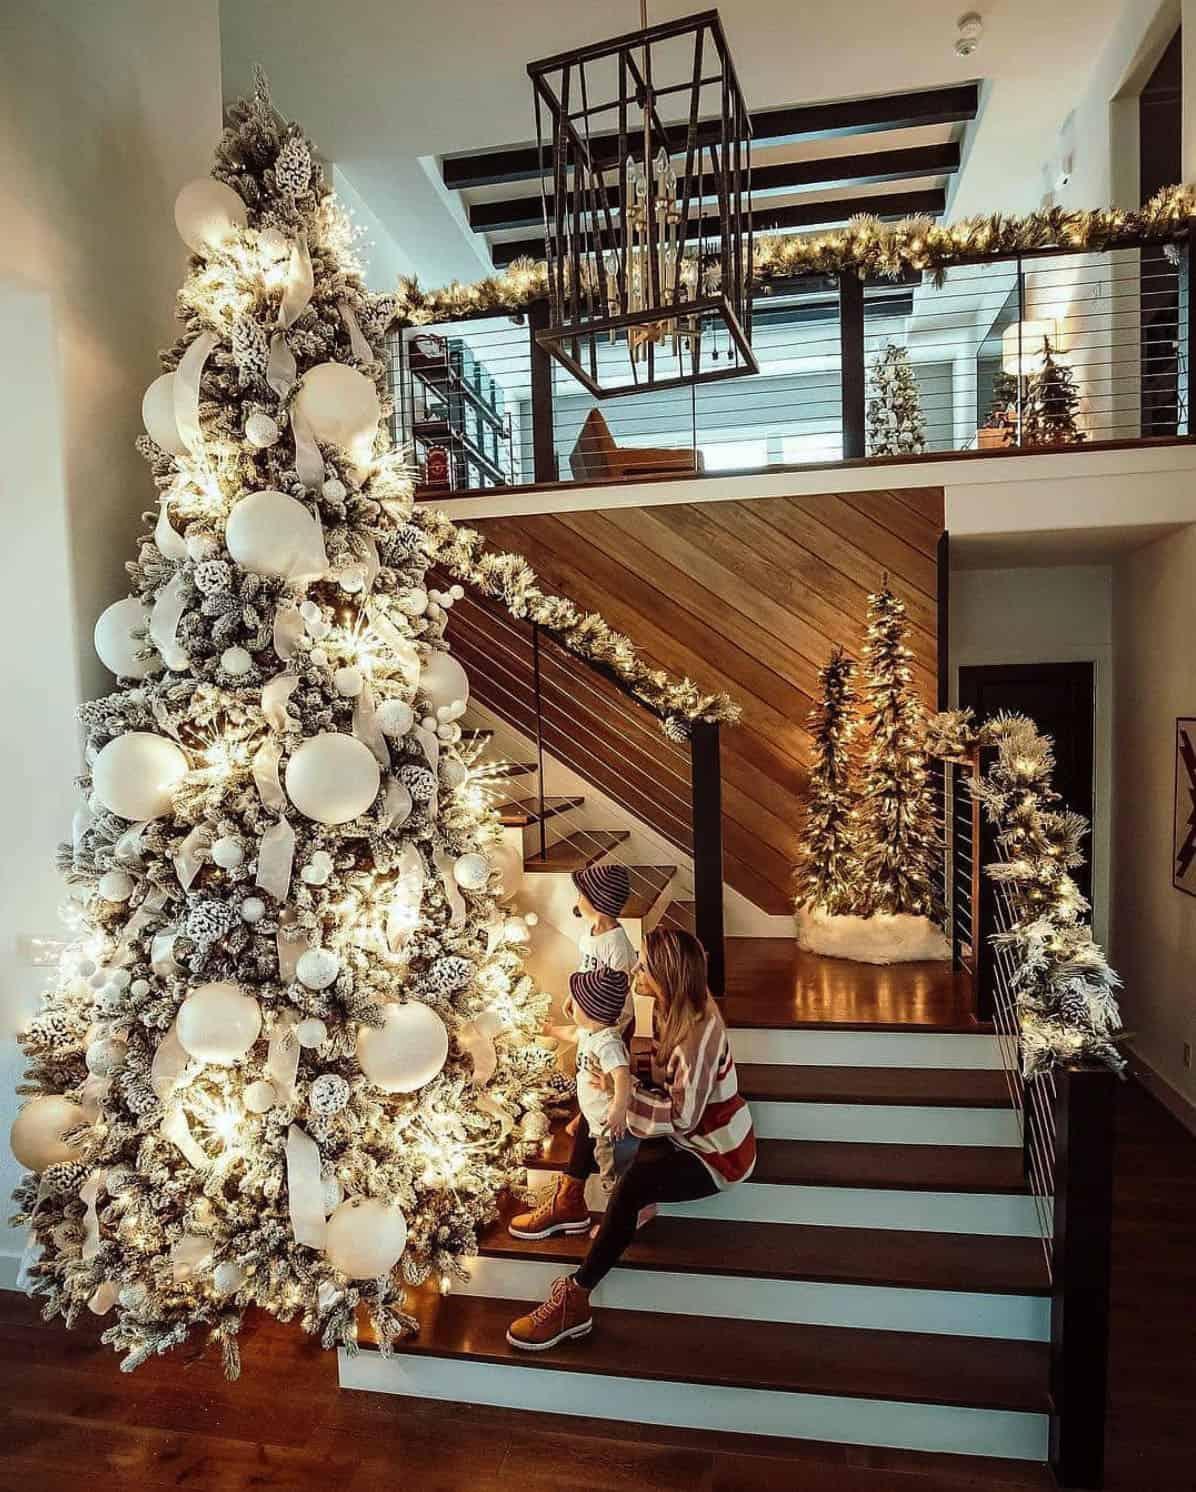 holiday-decor-ideas-staircase-tree